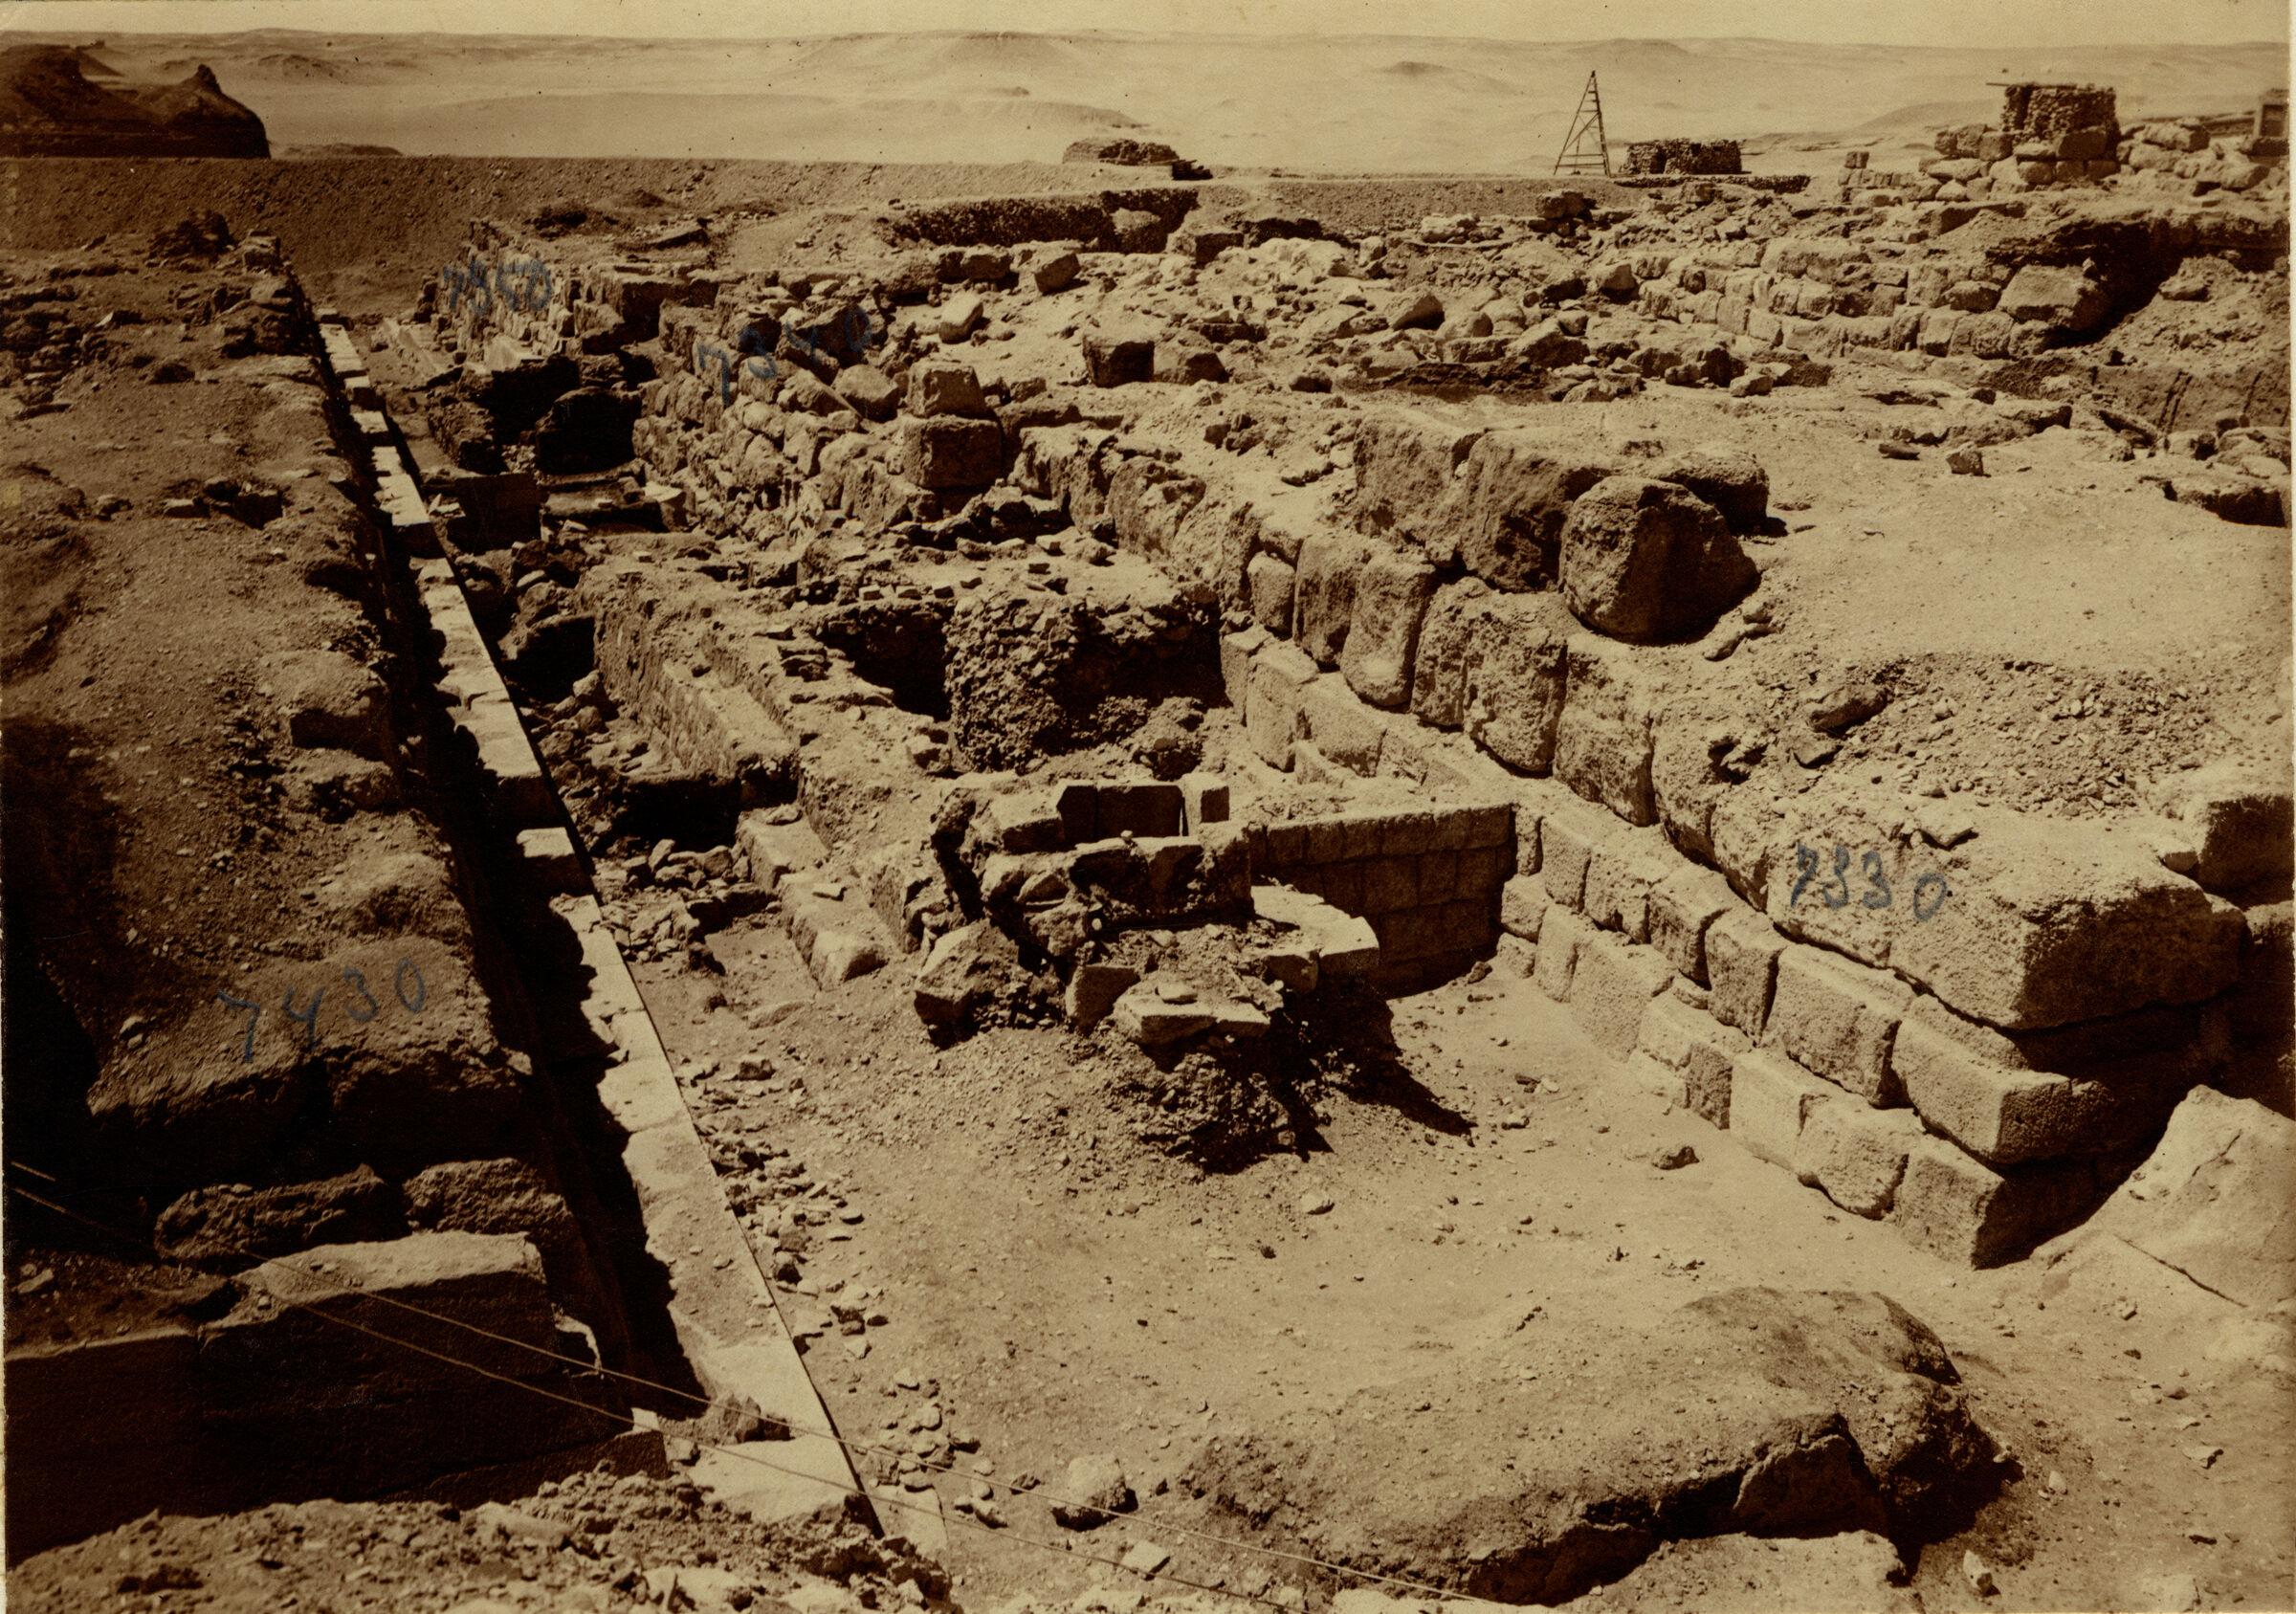 Eastern Cemetery: Site: Giza; View: street G 7300, G 7330-7340, G 7350, G 7331+7332, G 7430-7440